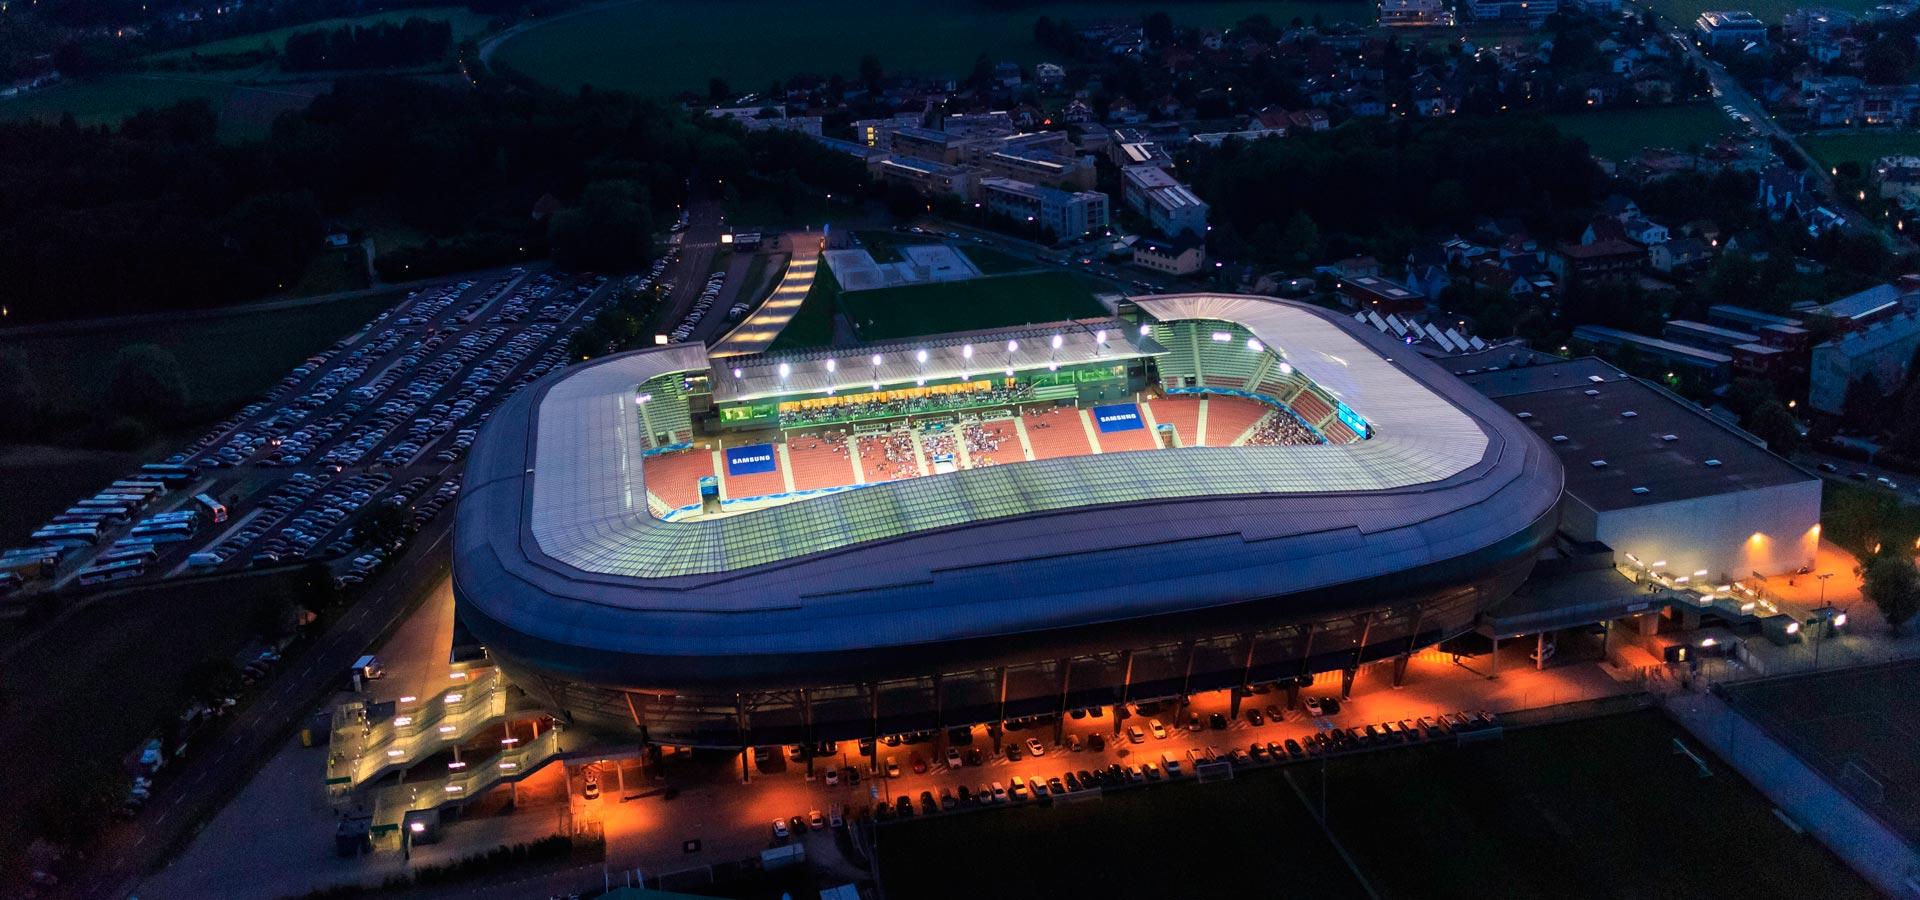 Stadion Klagenfurt Luftaufnahme